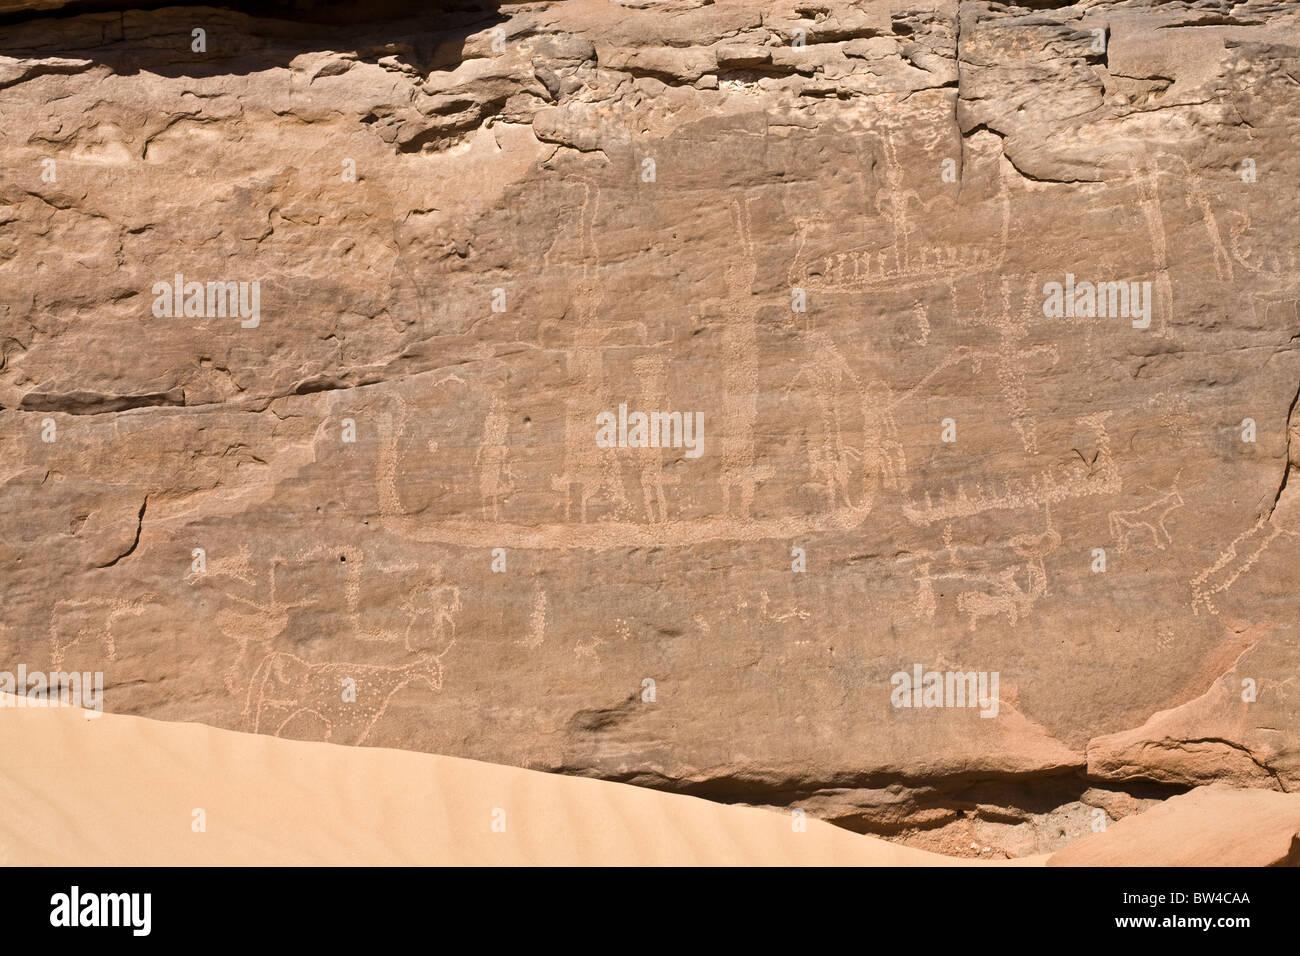 Hans Winkler's famous recorded Rock-Art site 26 in Wadi Abu Wasil in the Eastern Desert of Egypt. - Stock Image